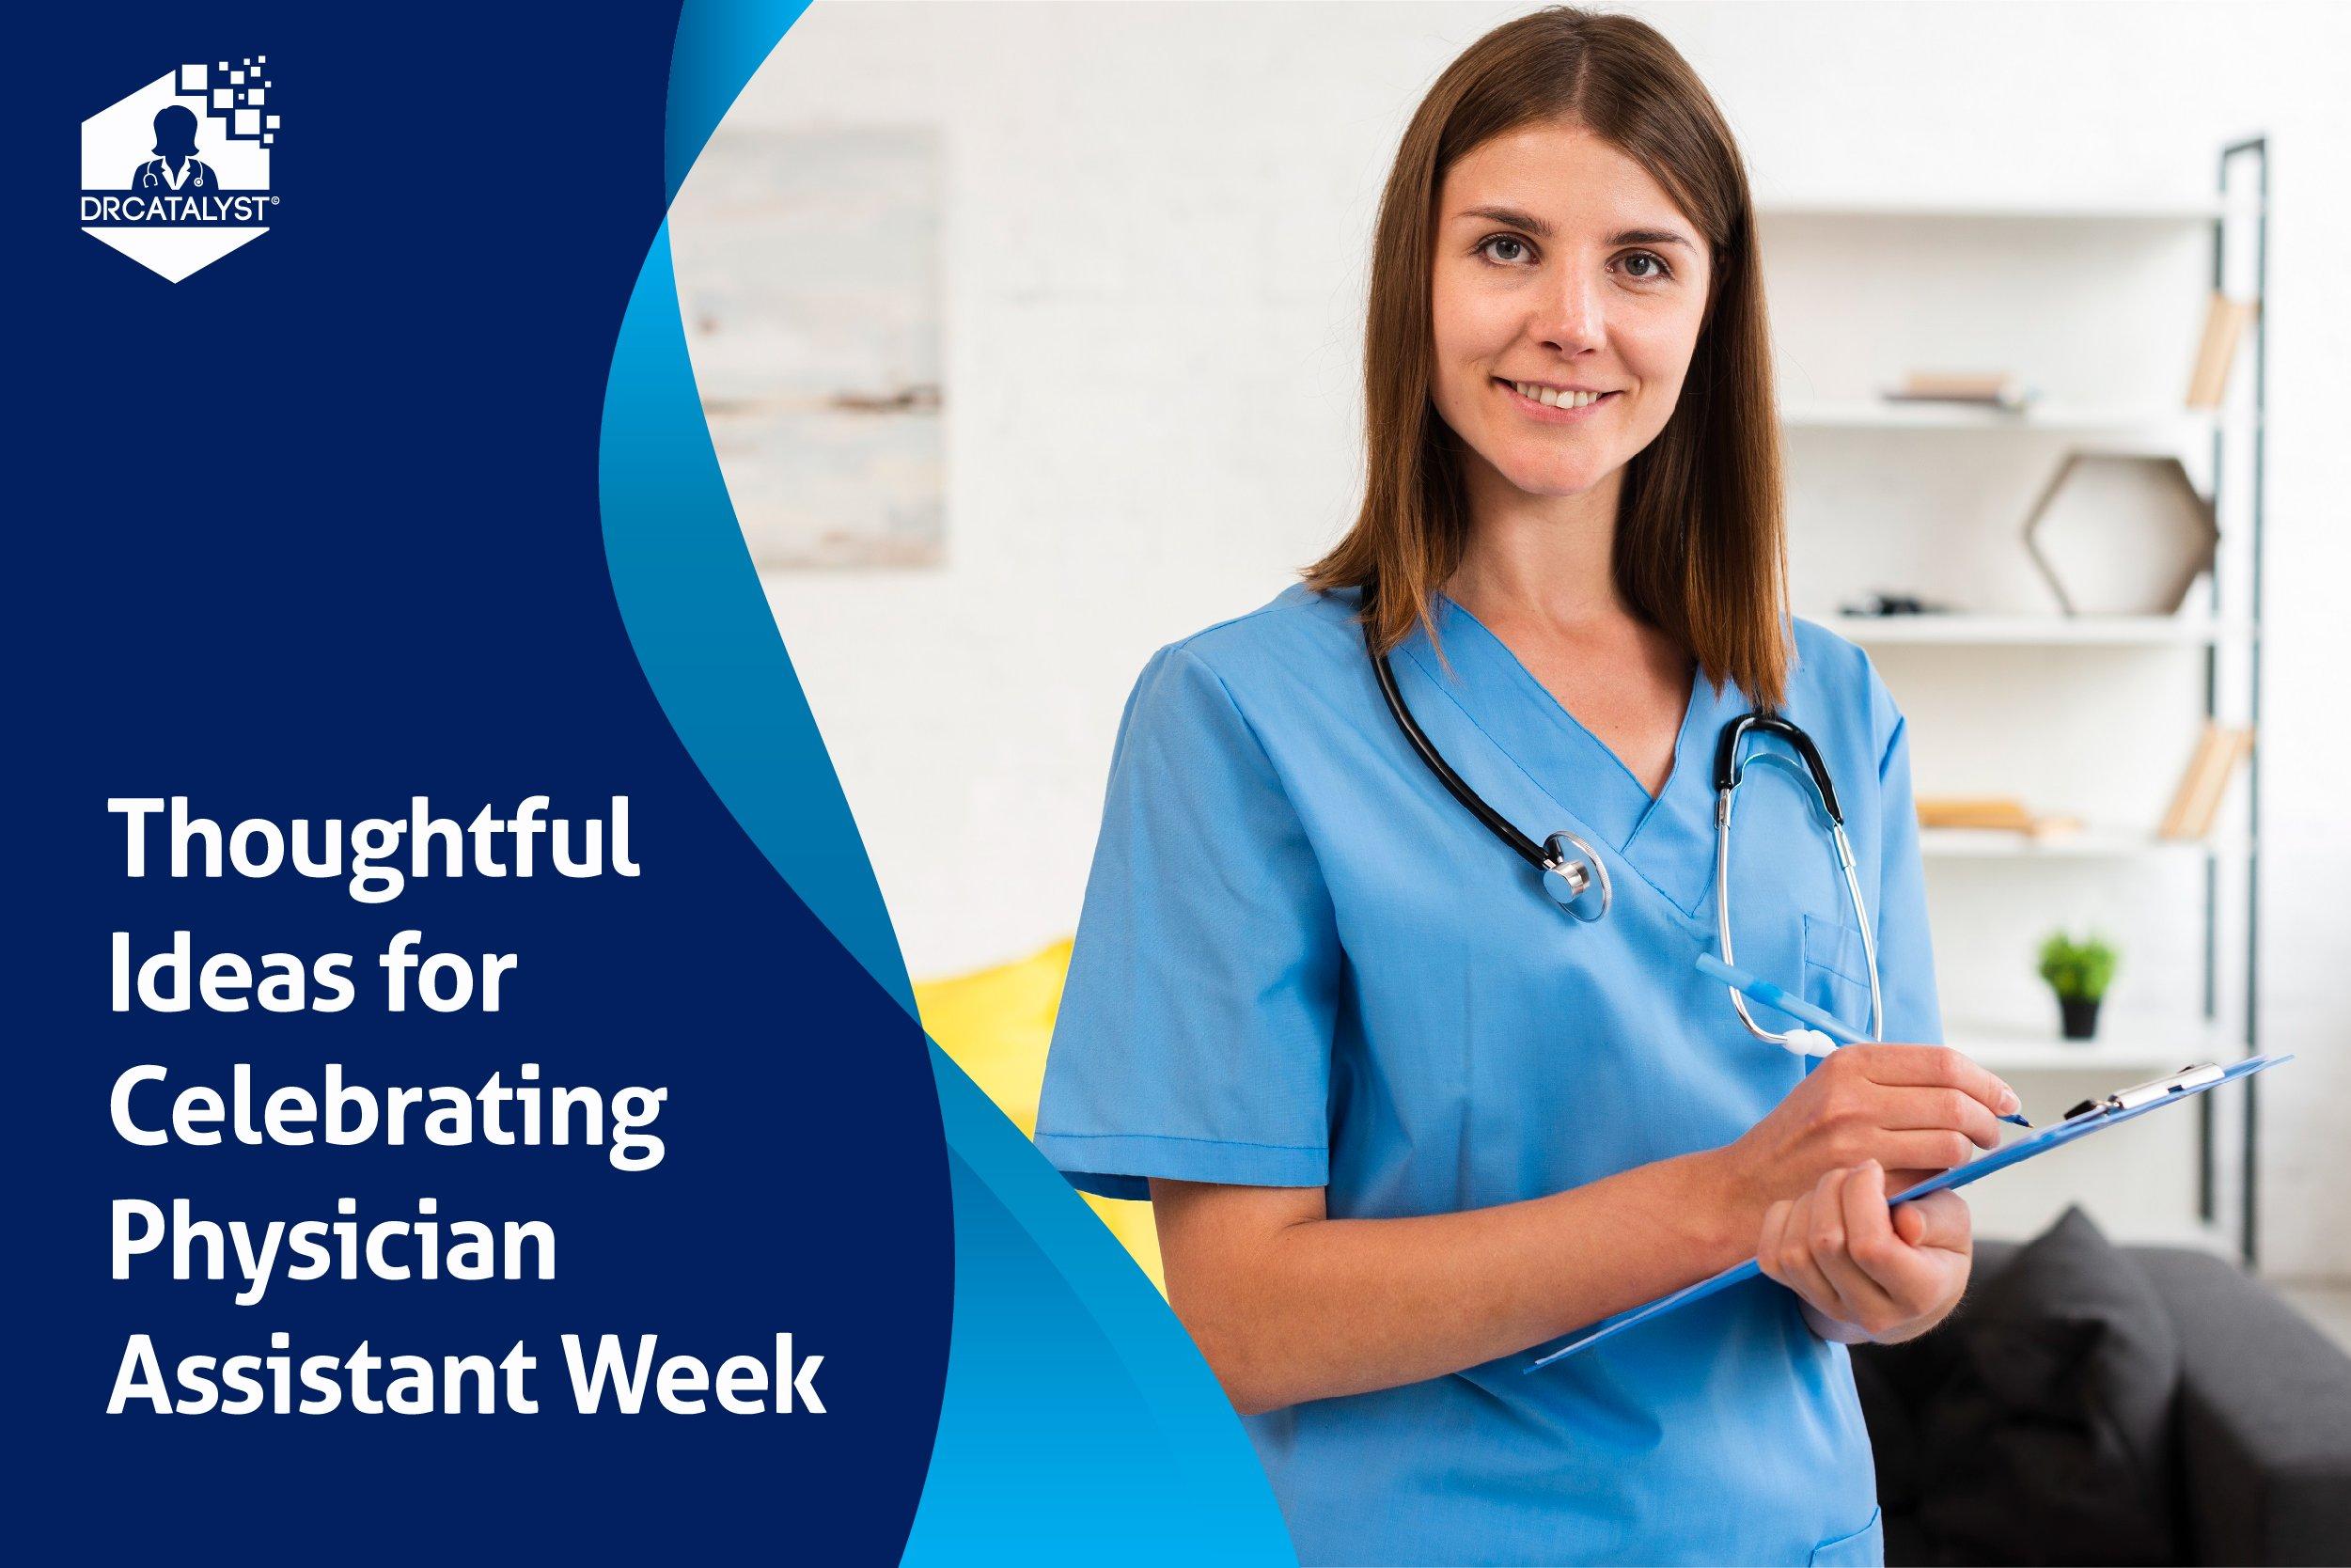 Patient Assistant Week